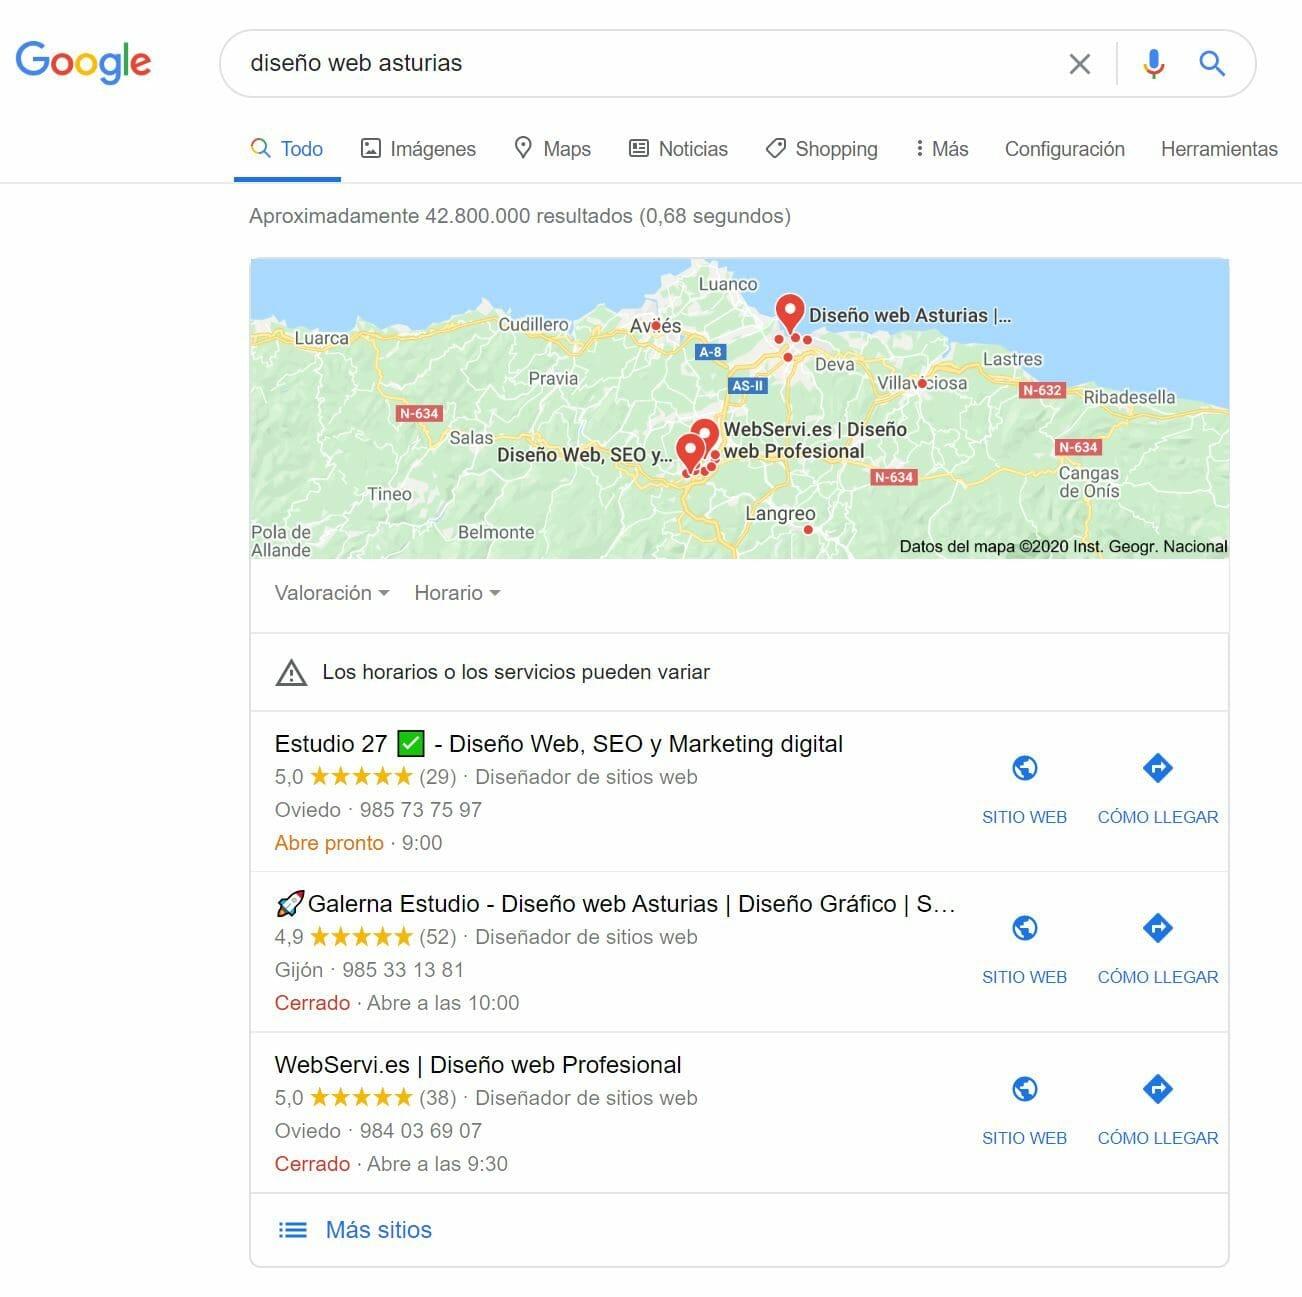 diseño web asturias google my business